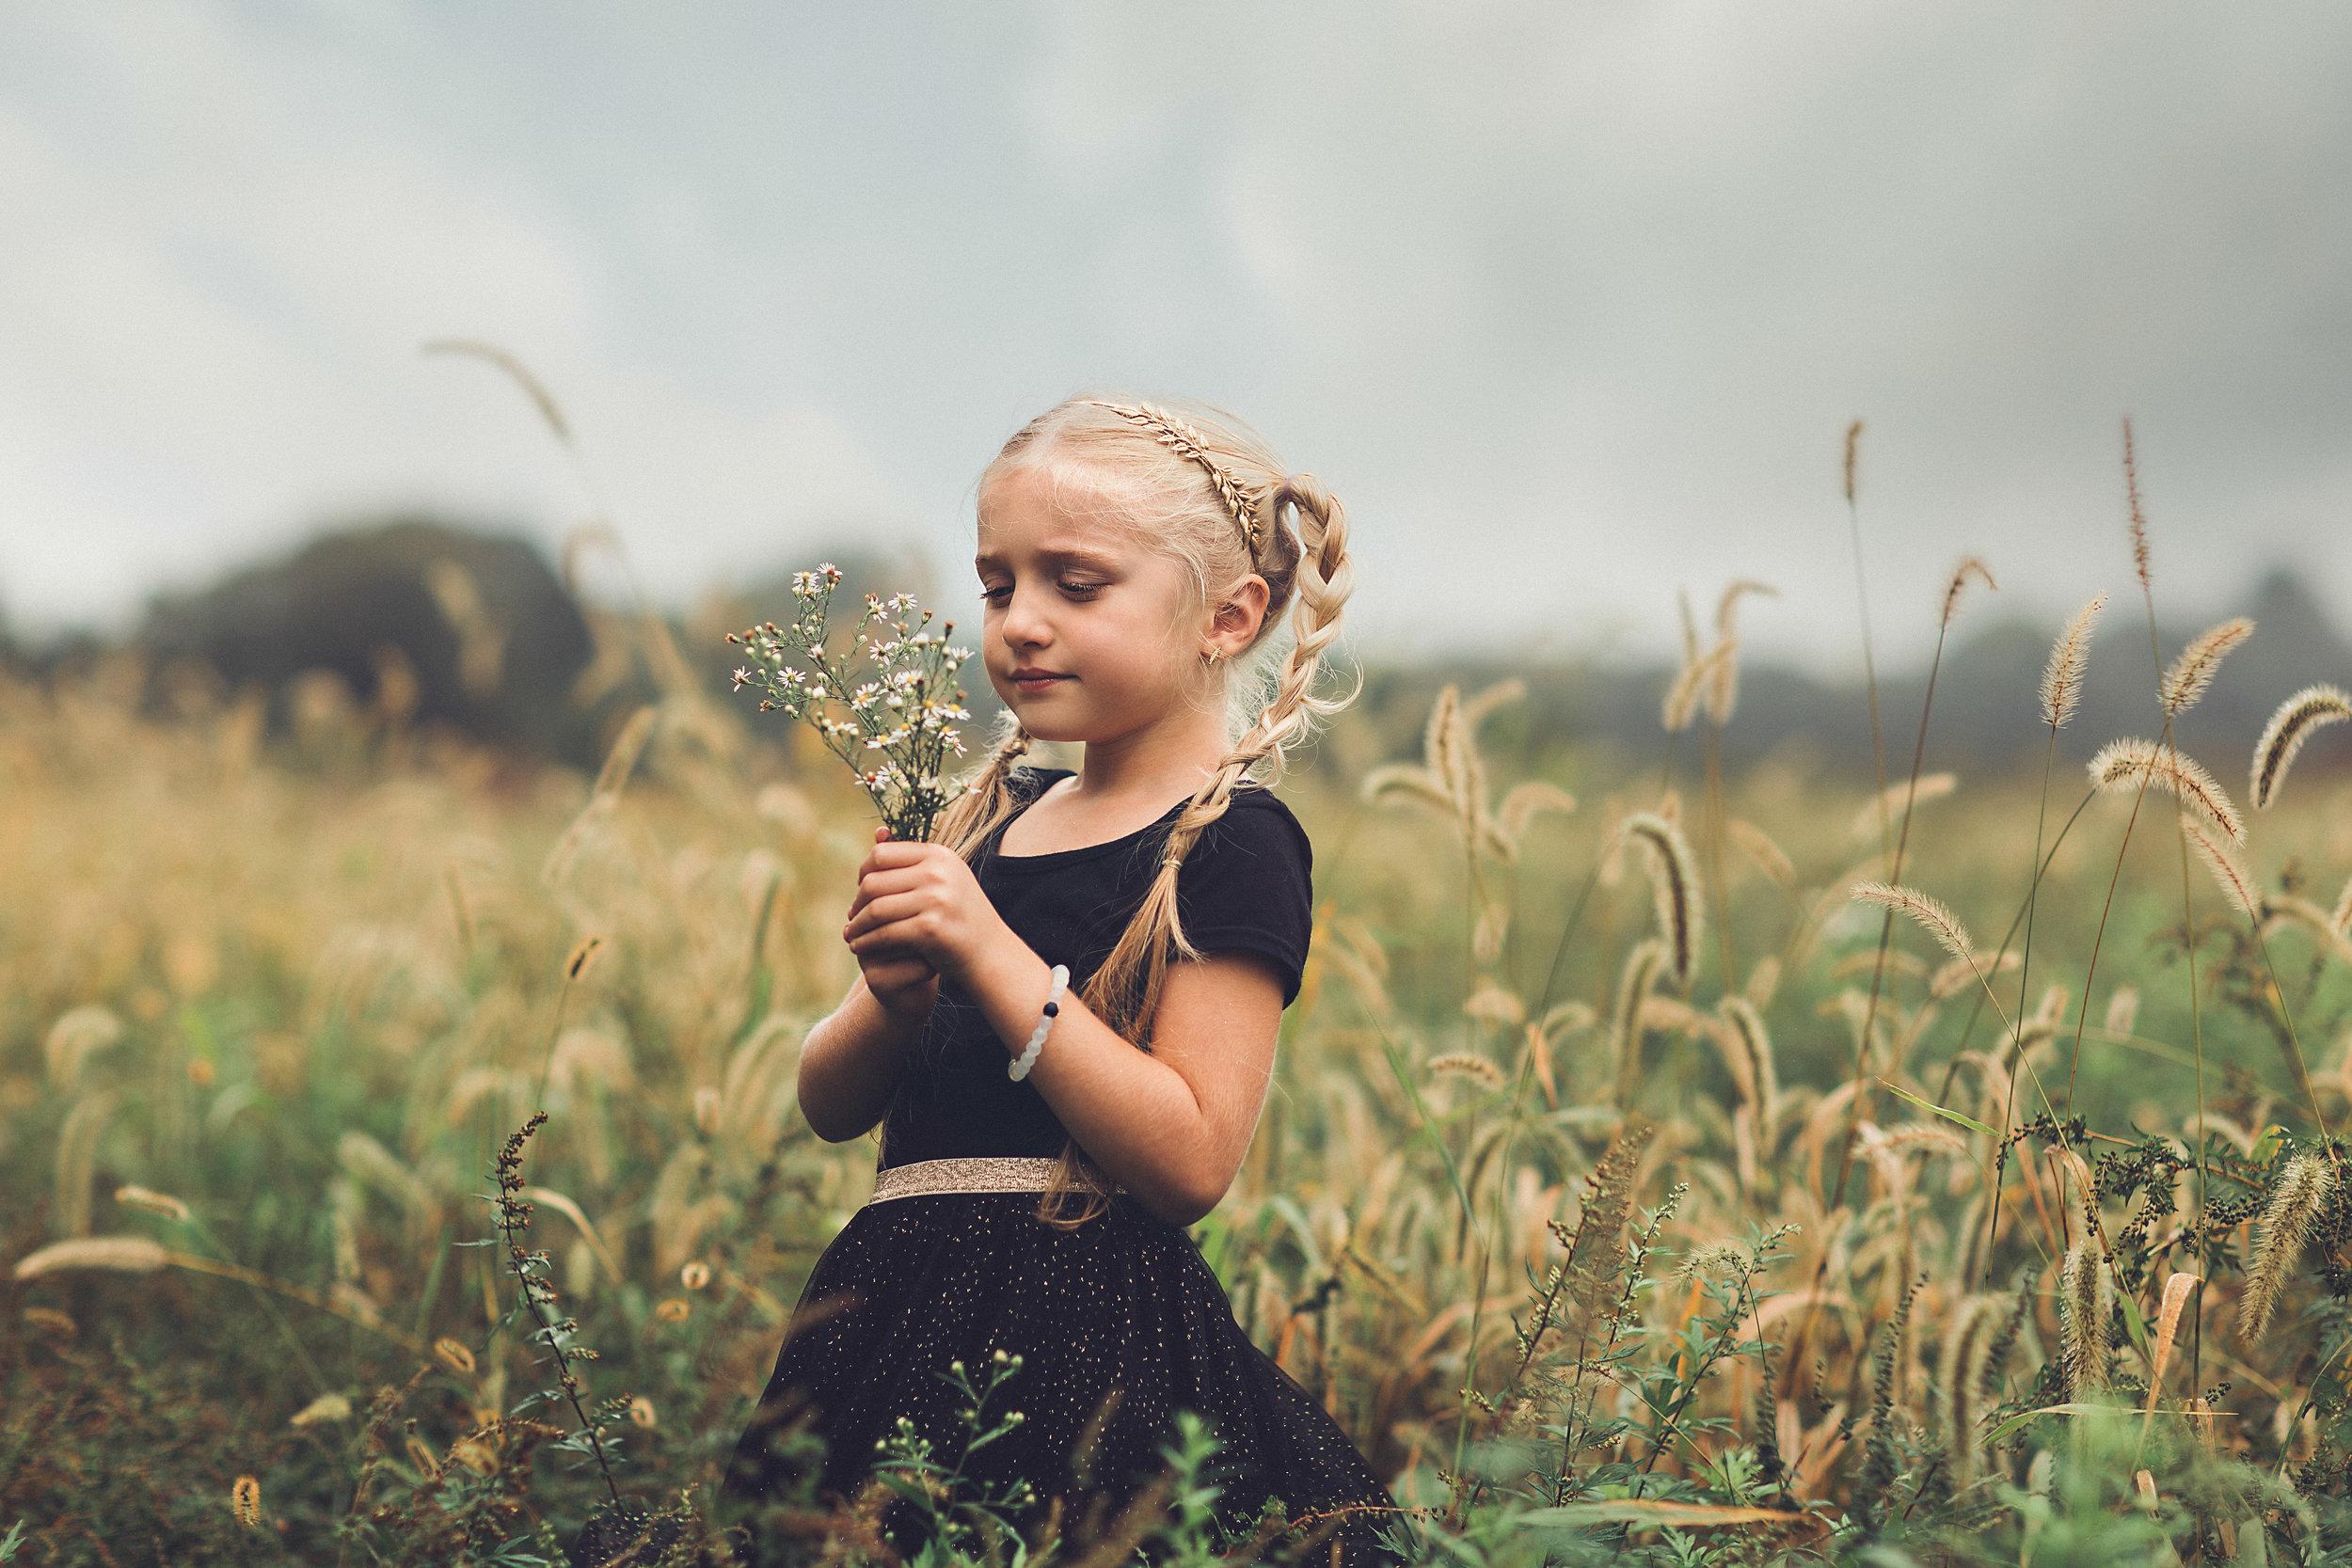 hello-olivia-photography-long-island-photographer-offset-artist-portrait-child-field-middle-island.jpg